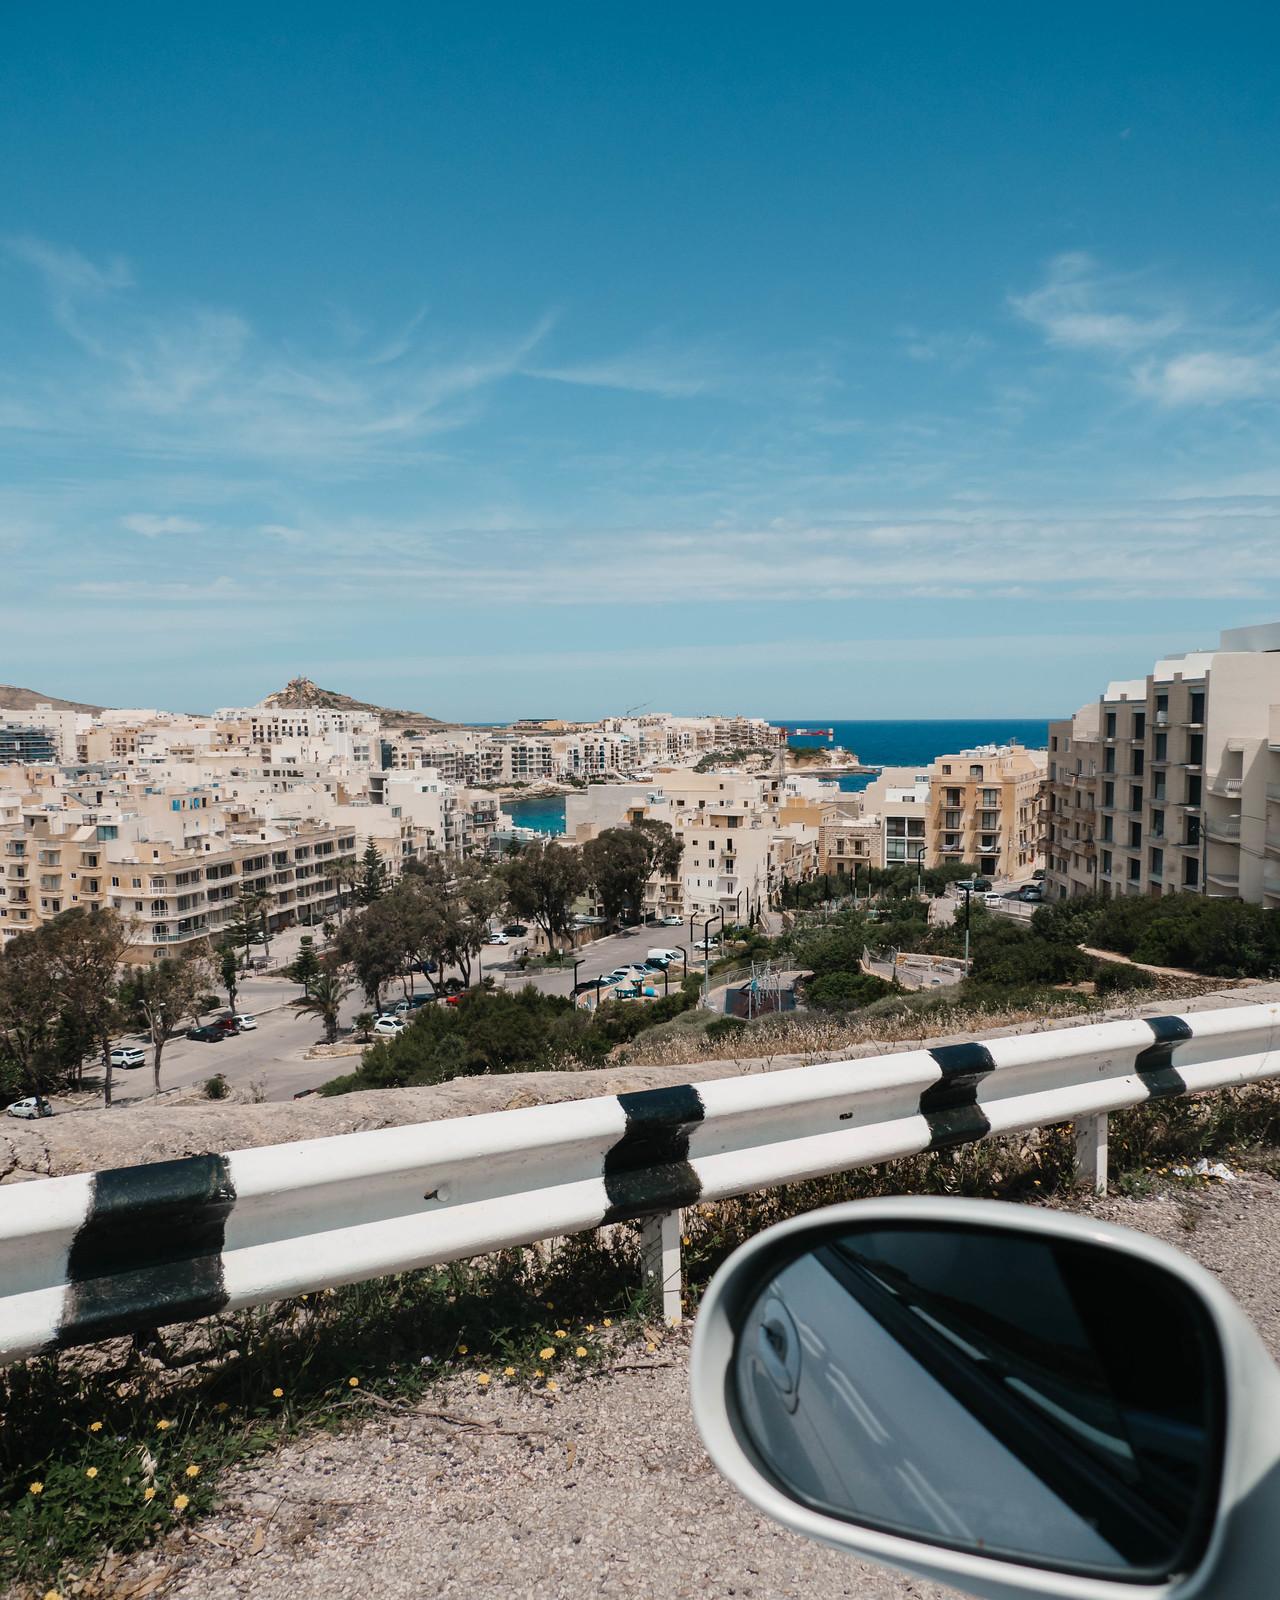 gozo julkinen liikenne